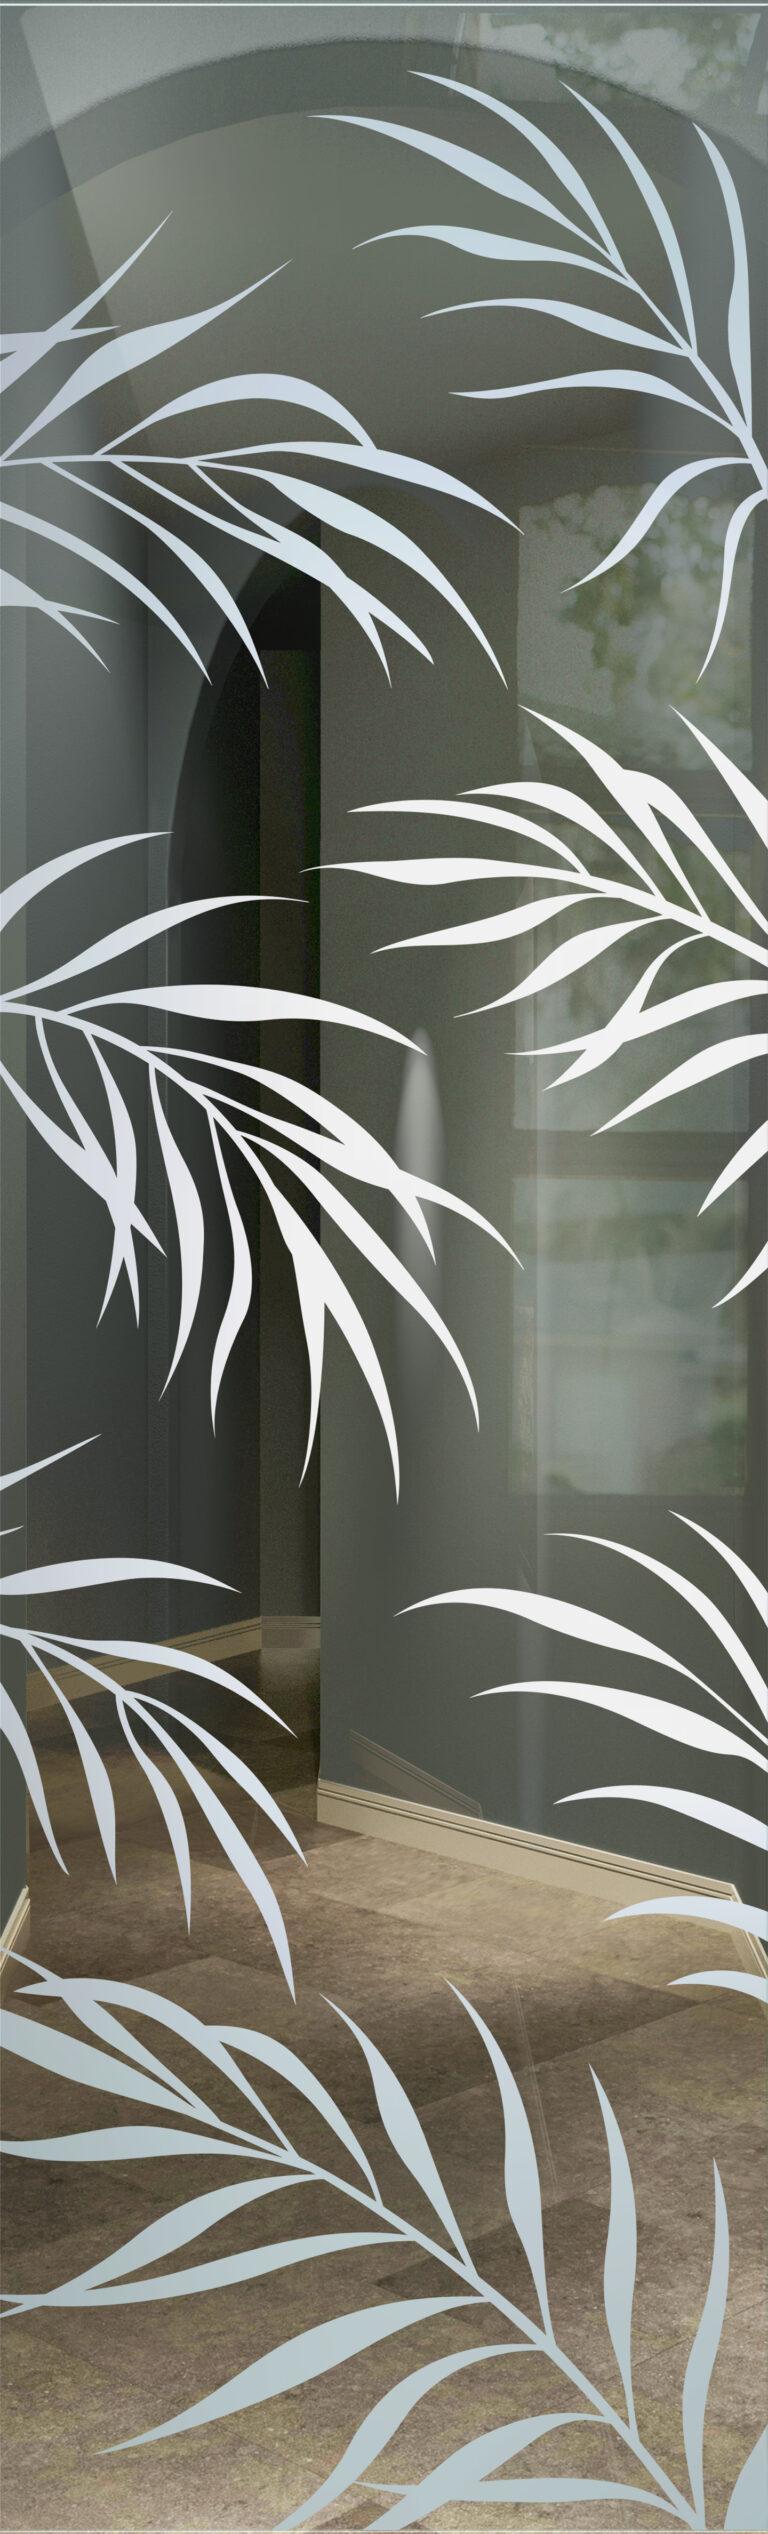 Ferns Inviting